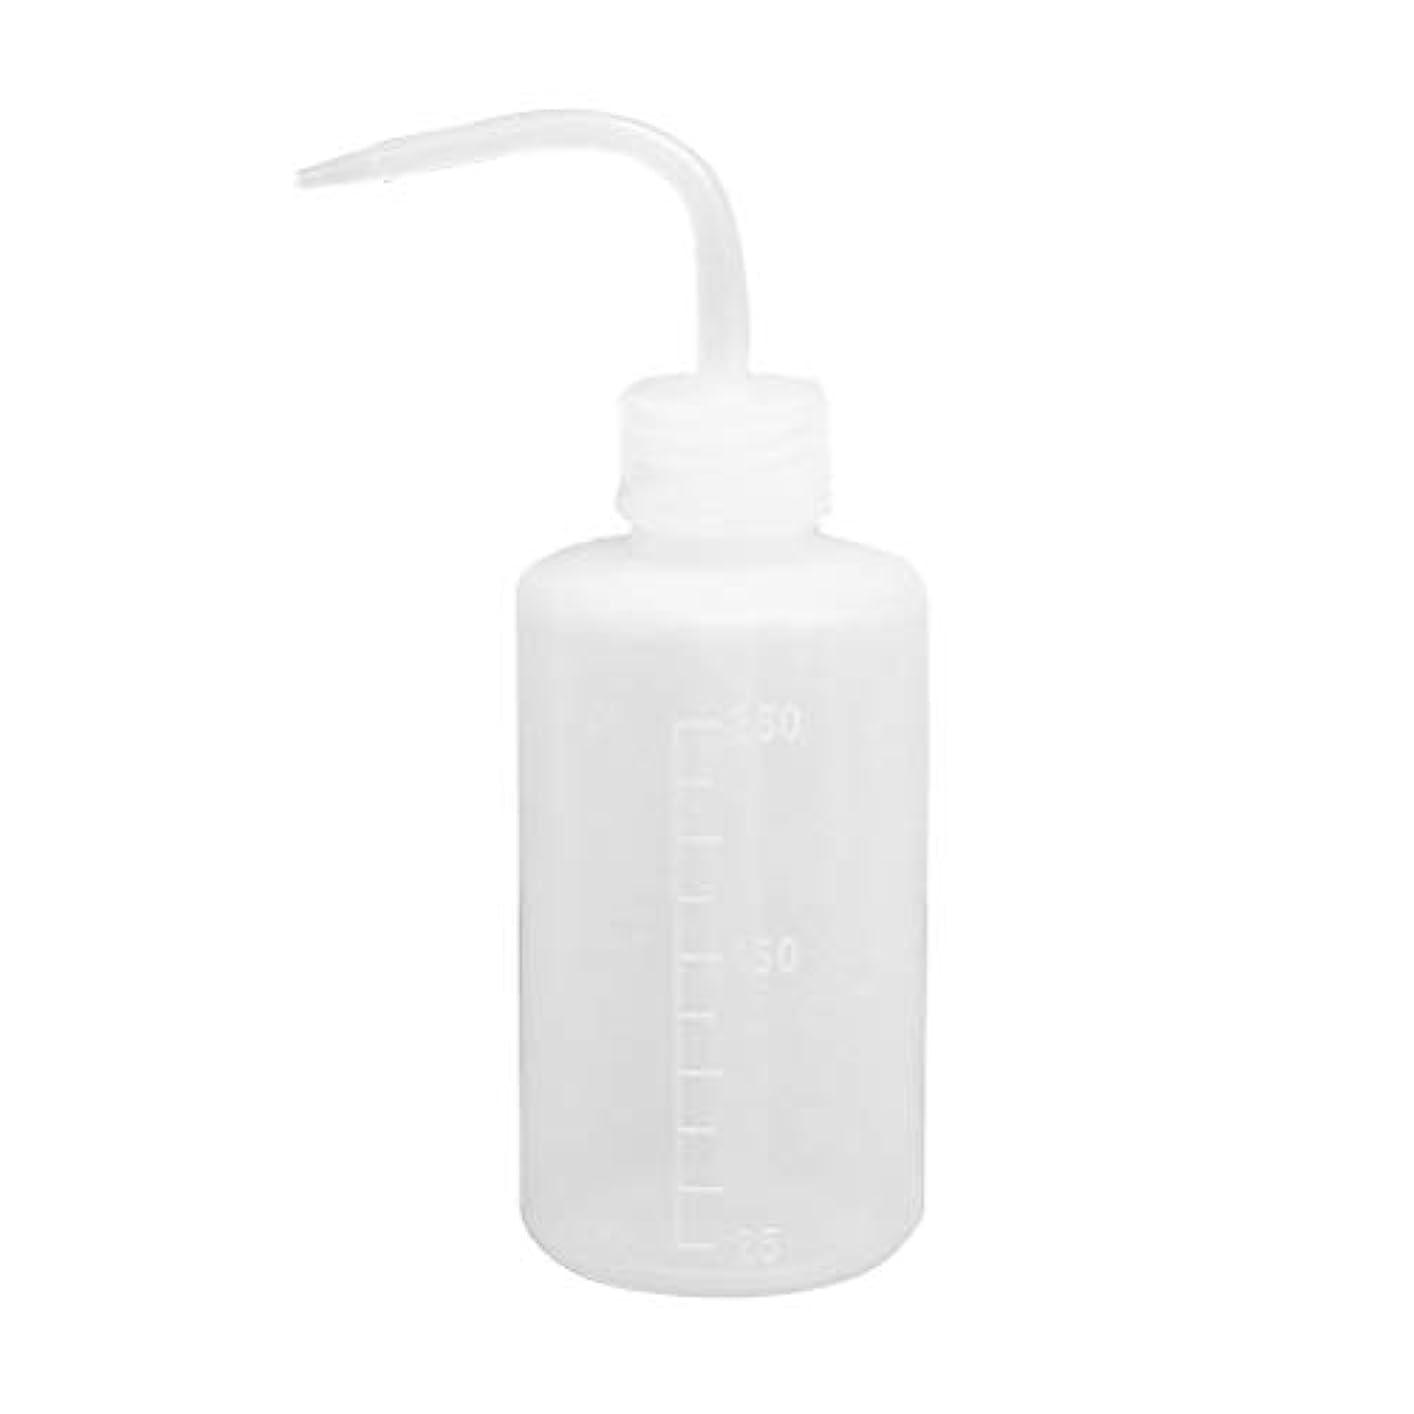 Healifty ベント口付き洗浄瓶絞り瓶250ml